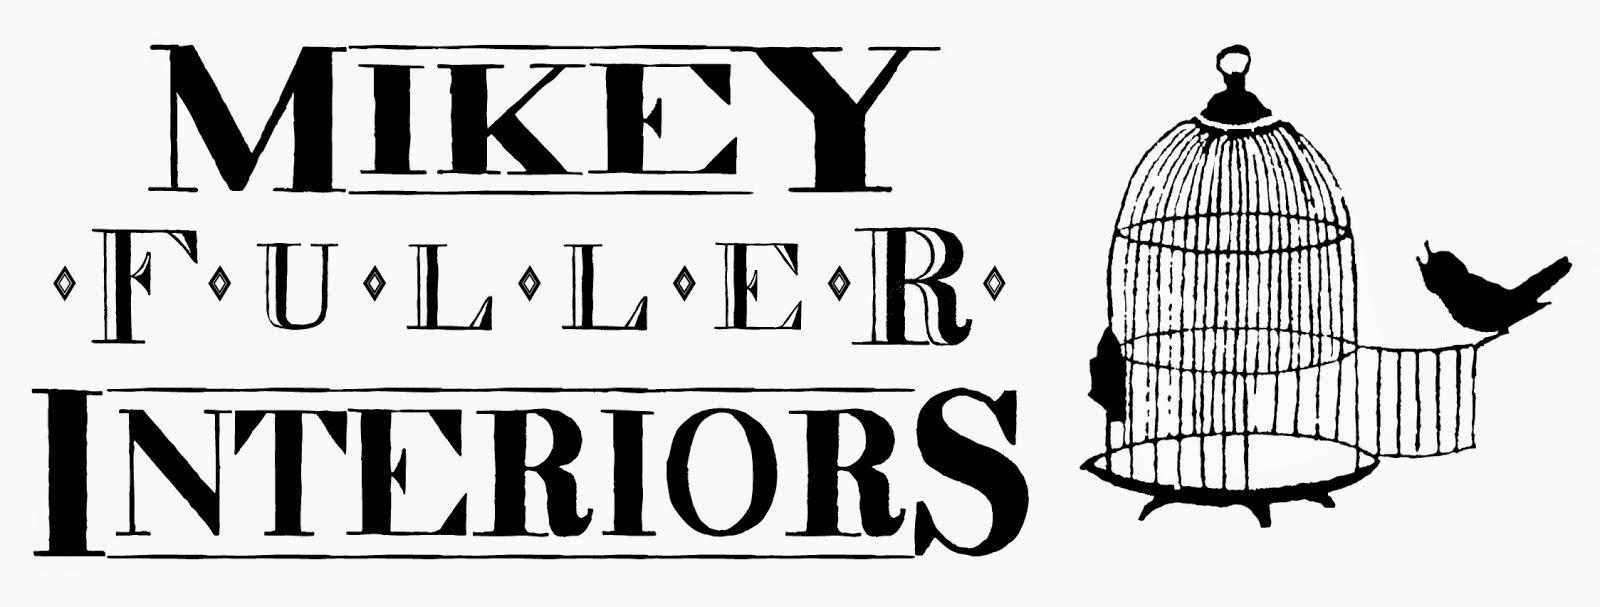 Mikey Fuller | Interiors